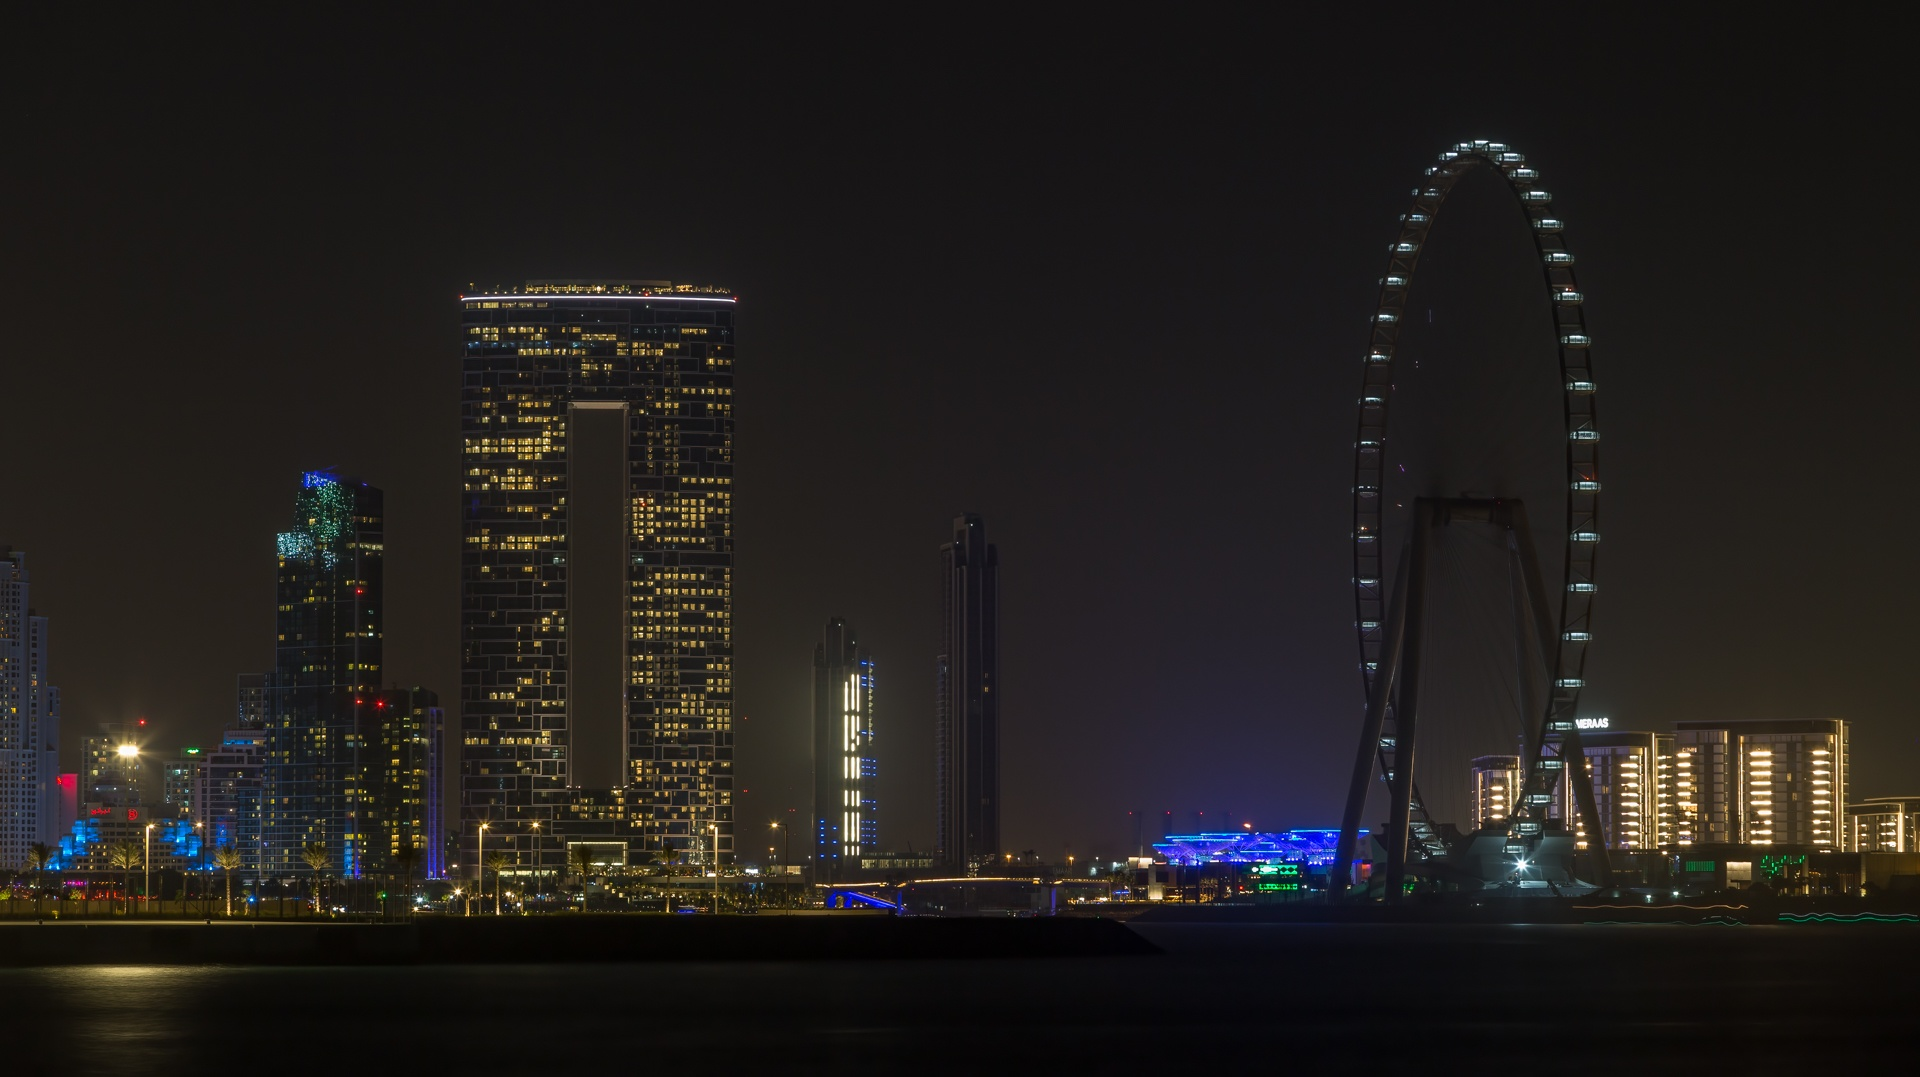 The Giant Ferris Wheel in Dubai